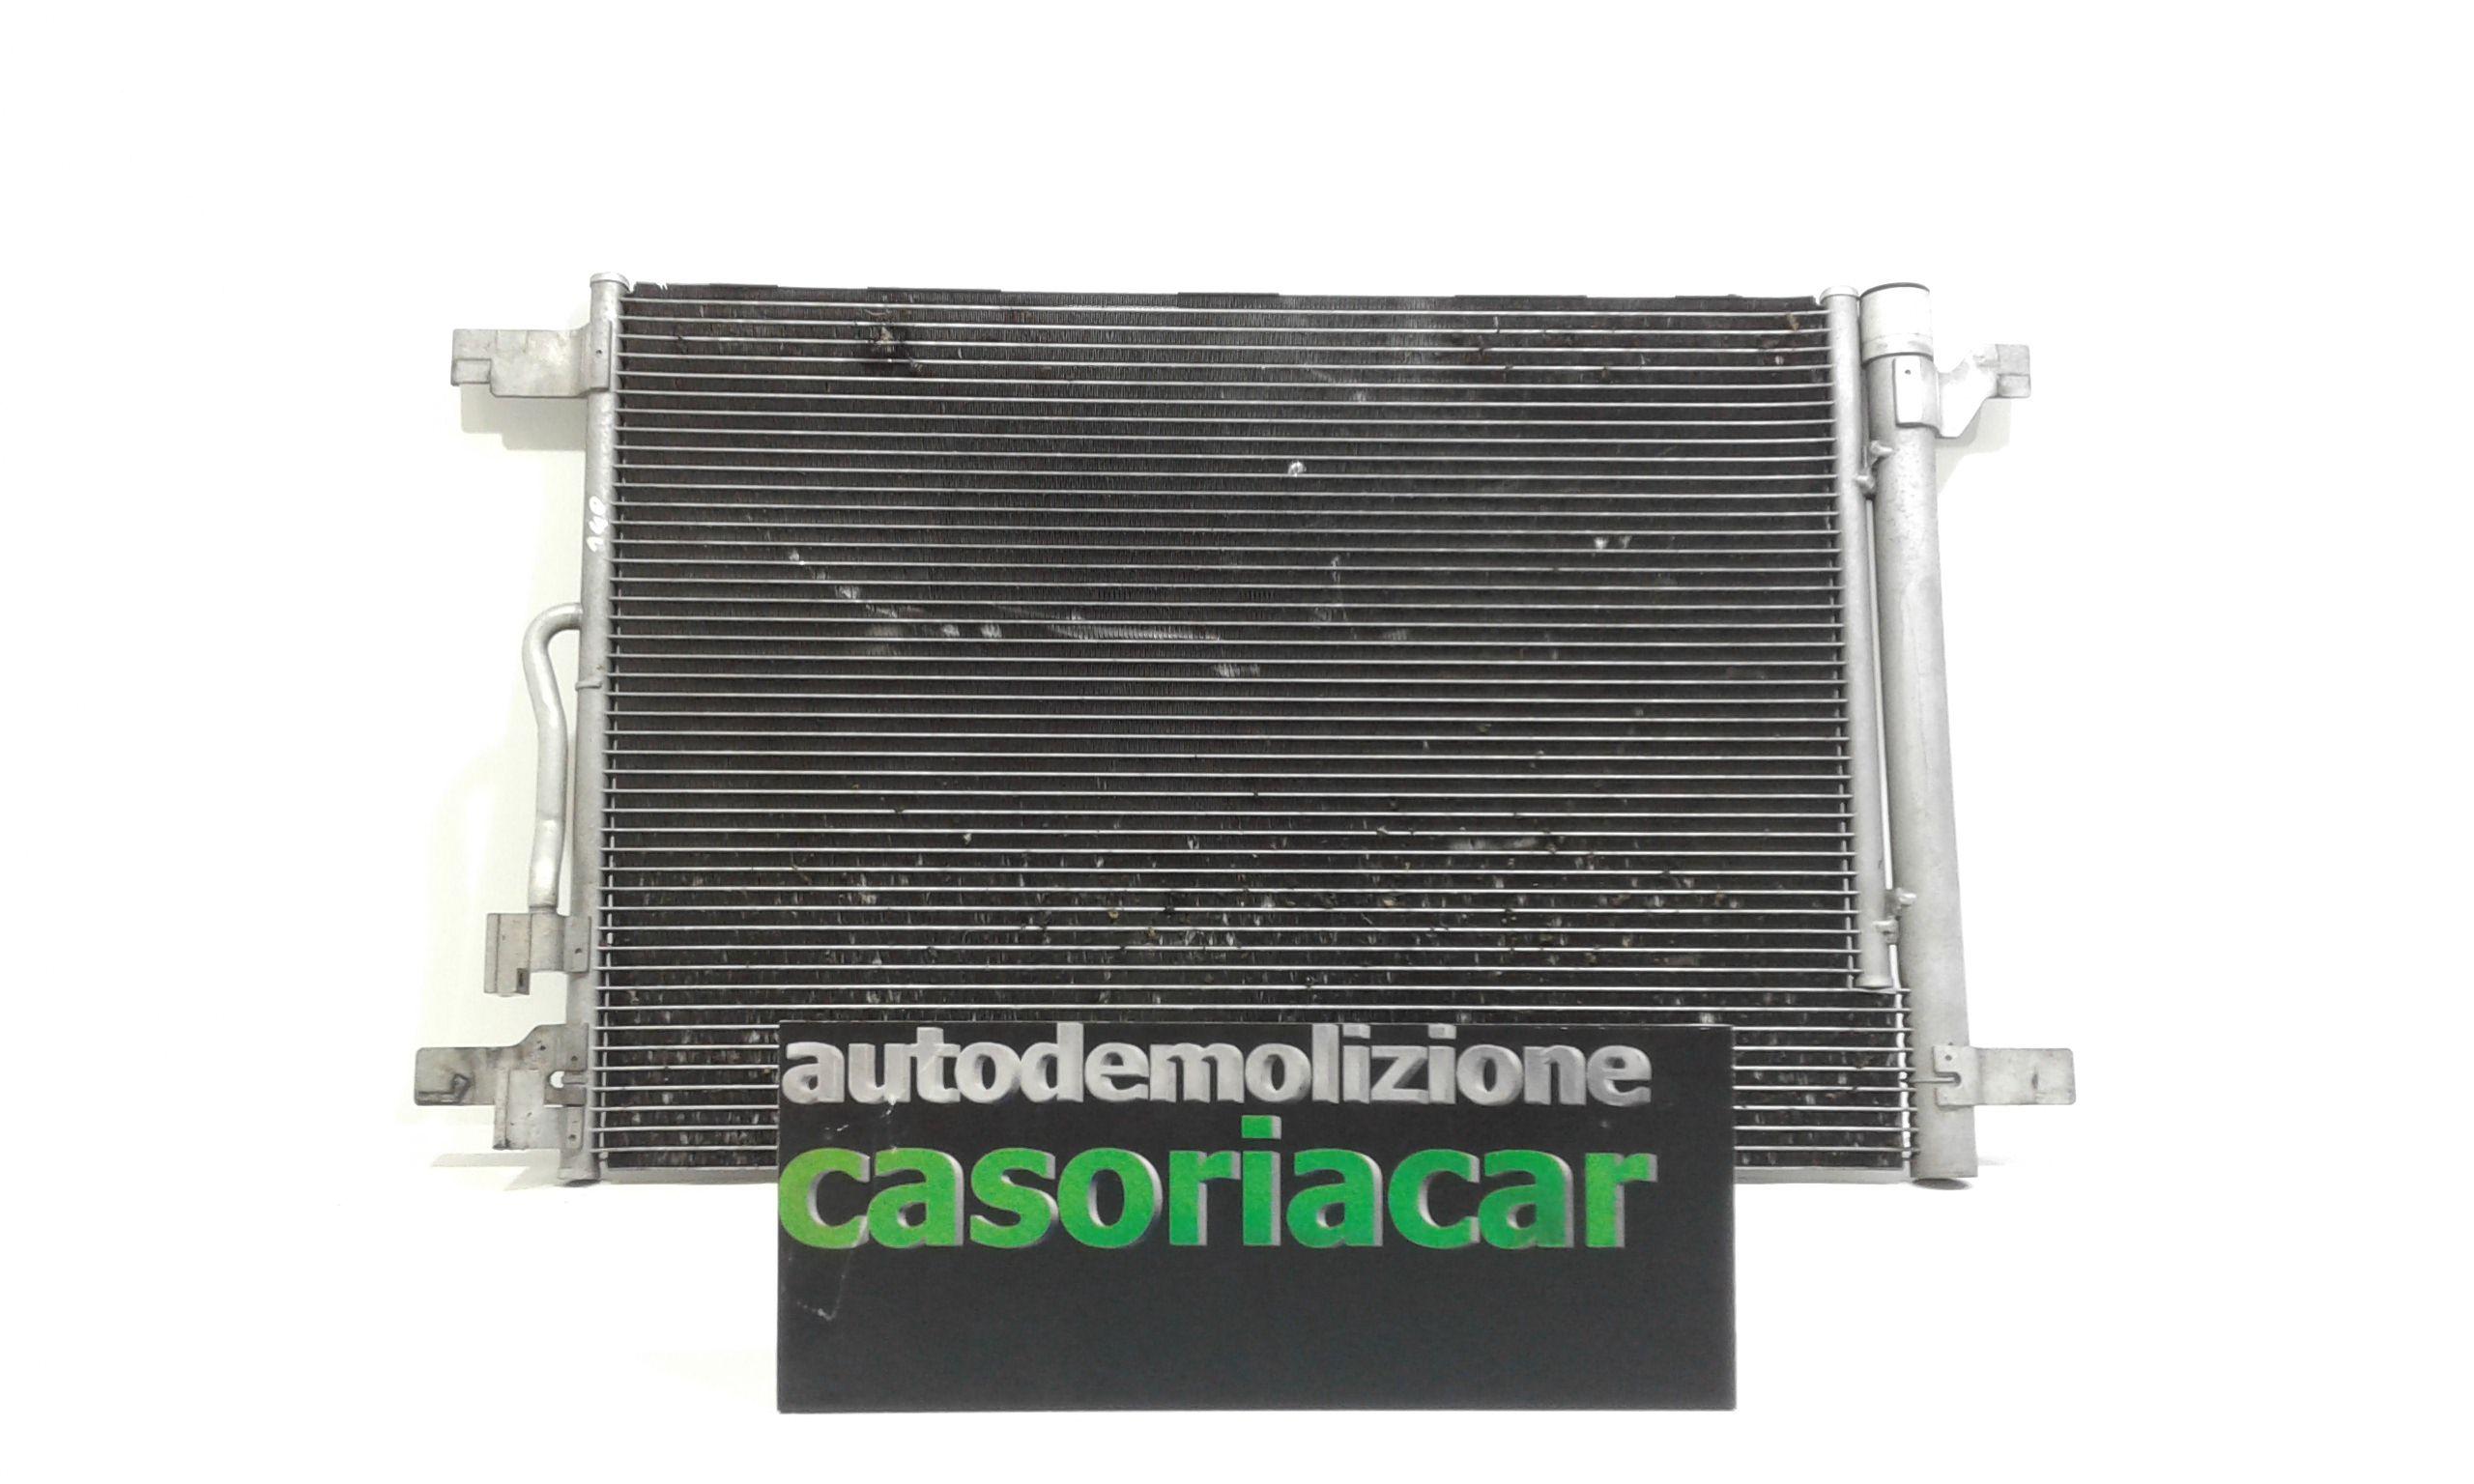 RADIATORE A/C VOLKSWAGEN Tiguan Serie 2000 Diesel (2016) RICAMBI USATI